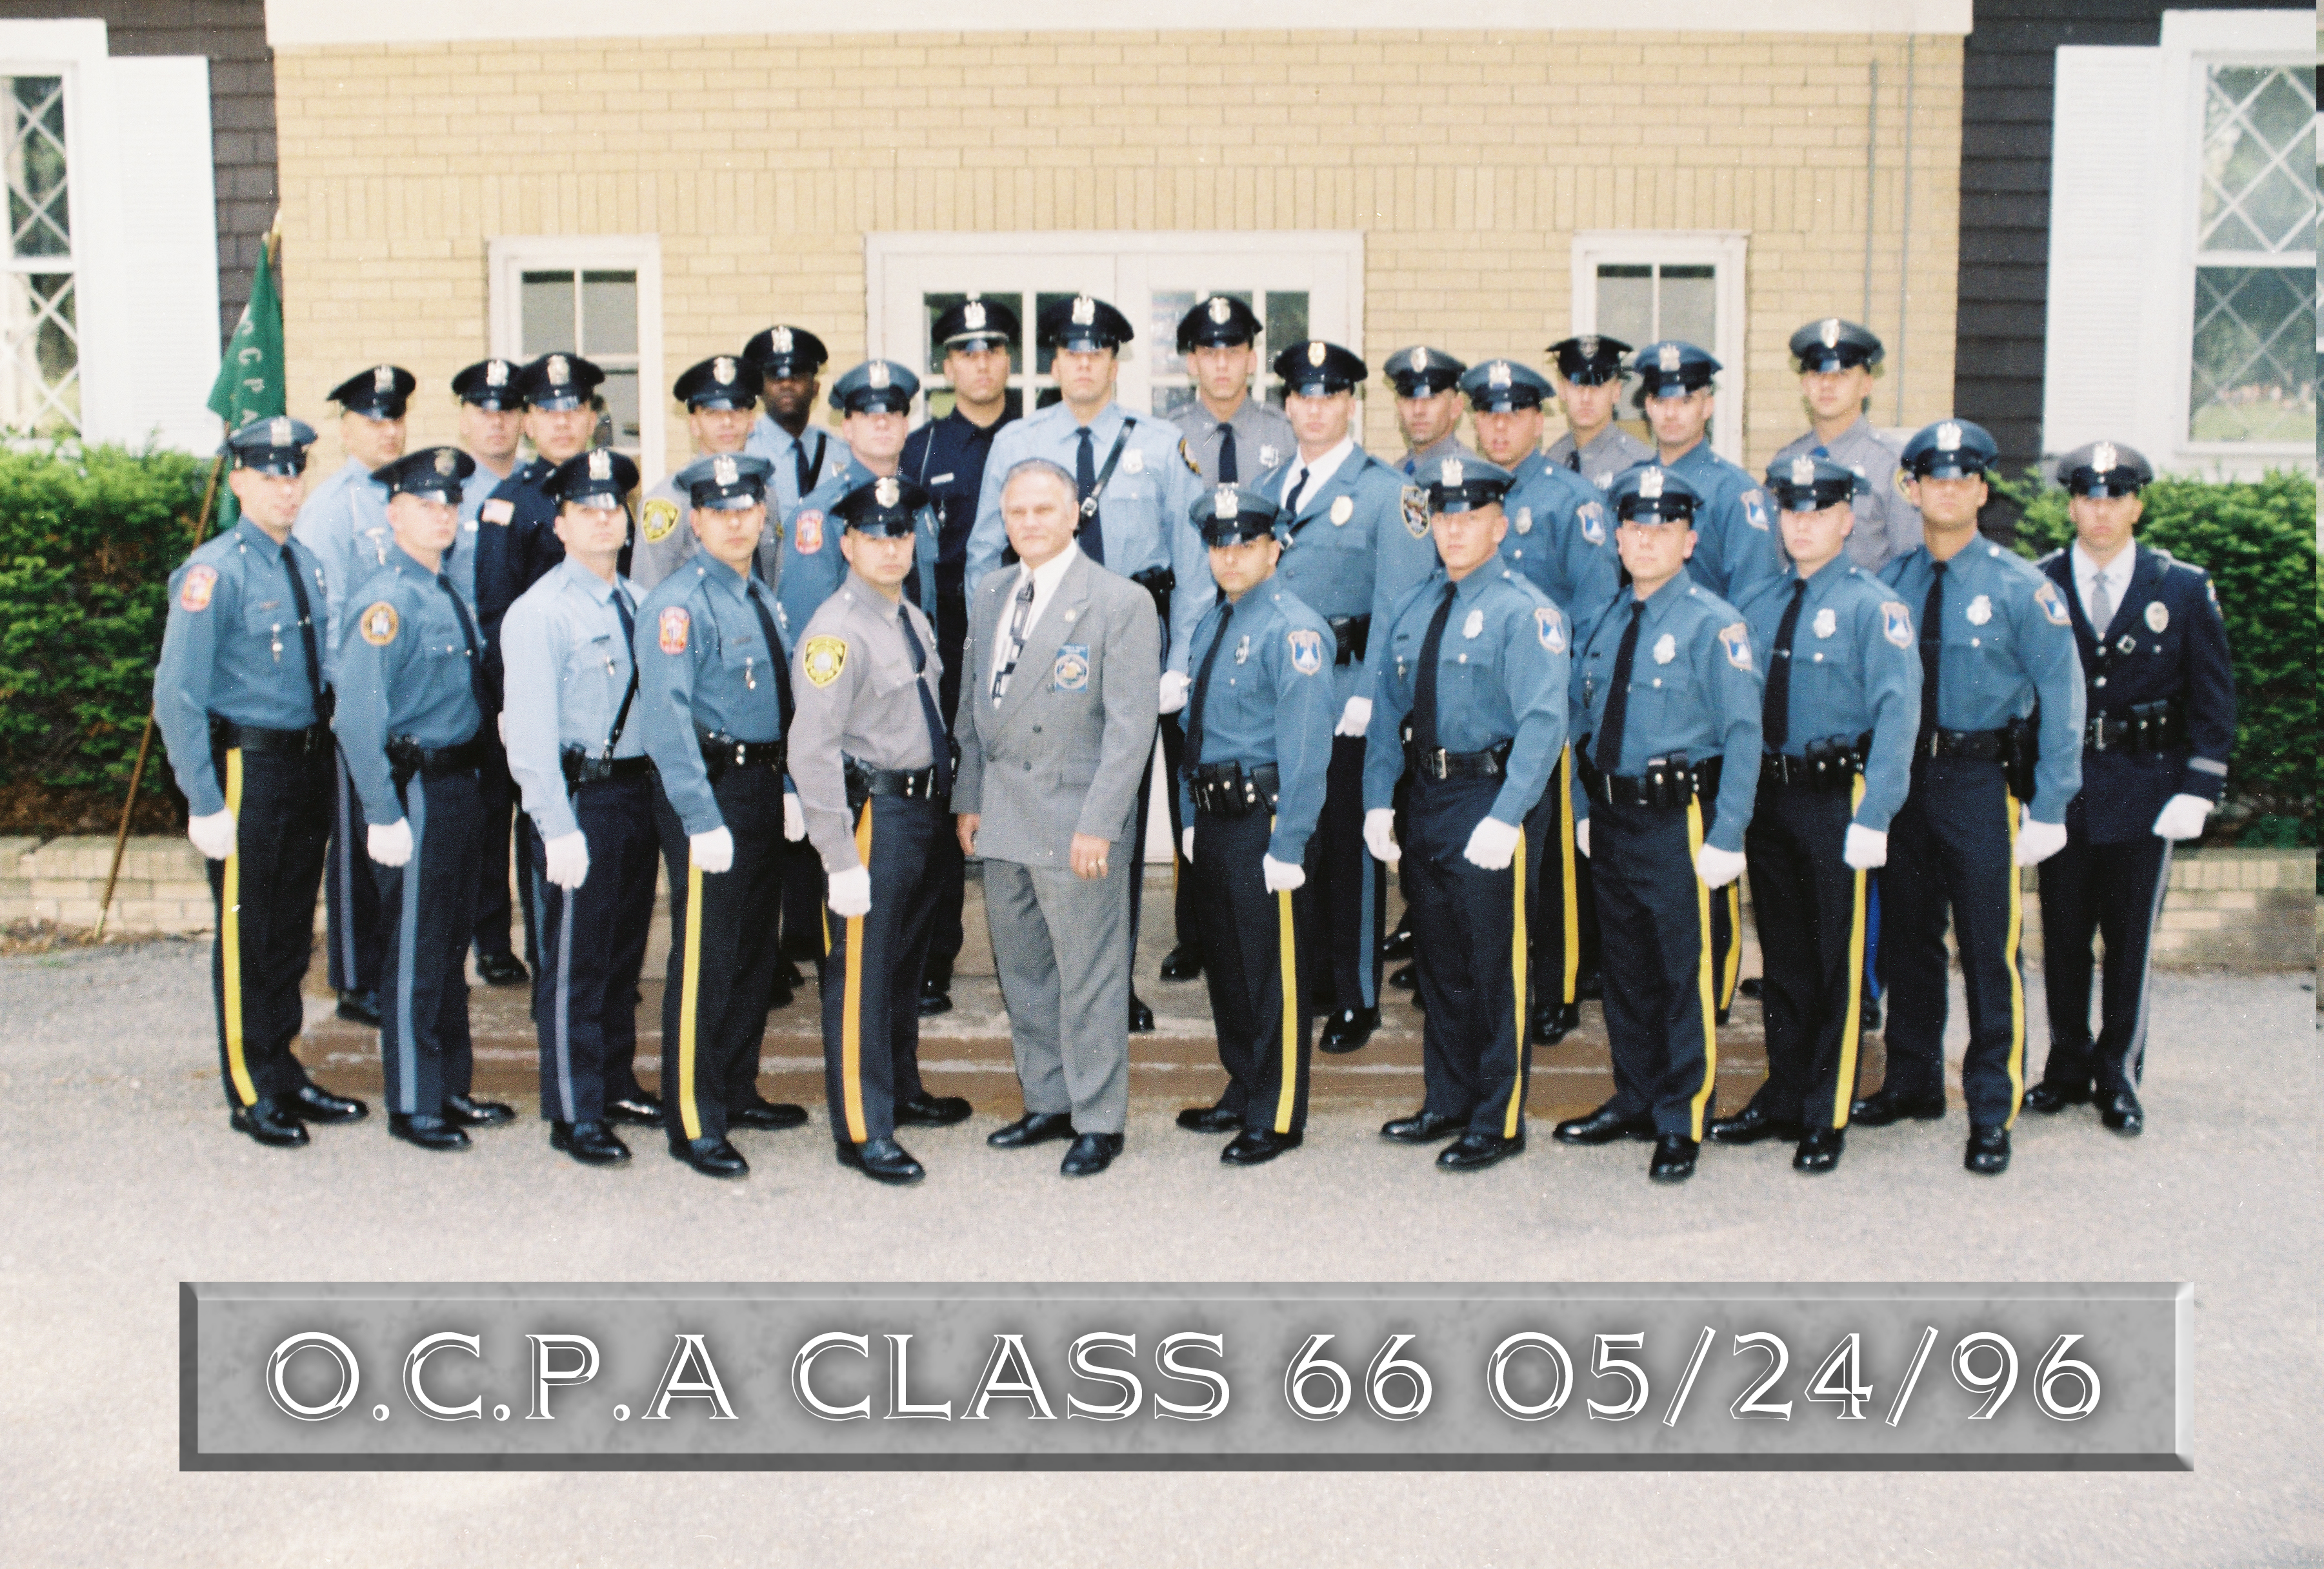 Class #66